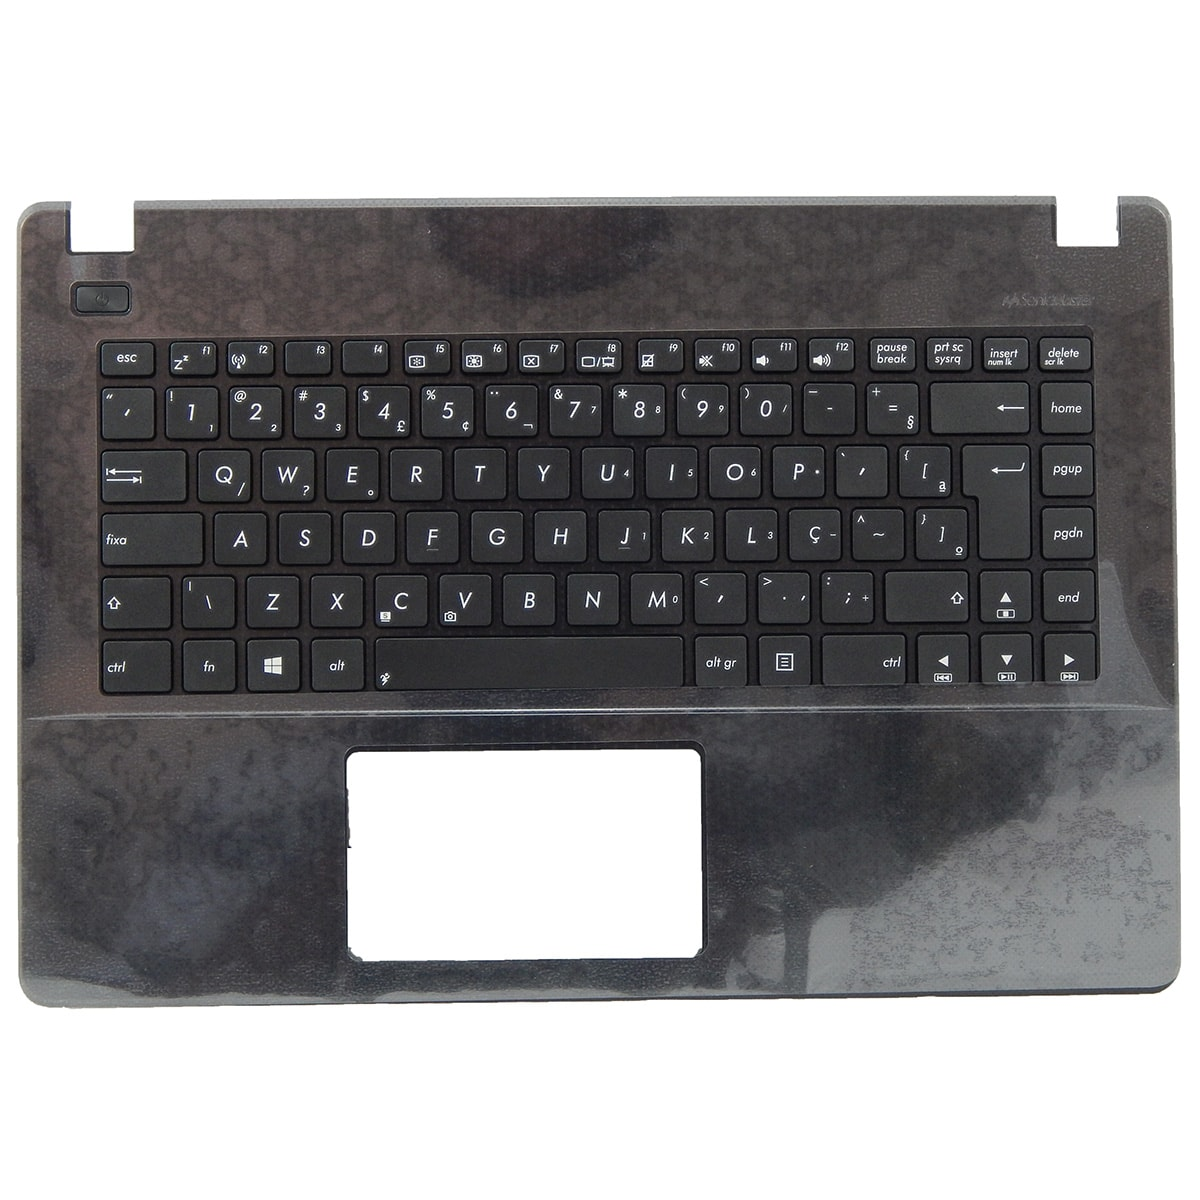 Teclado Ultrabook Asus X451ca/ma c/ Moldura Preta Sem Touch Pn: SN2531 / AEXJB600110